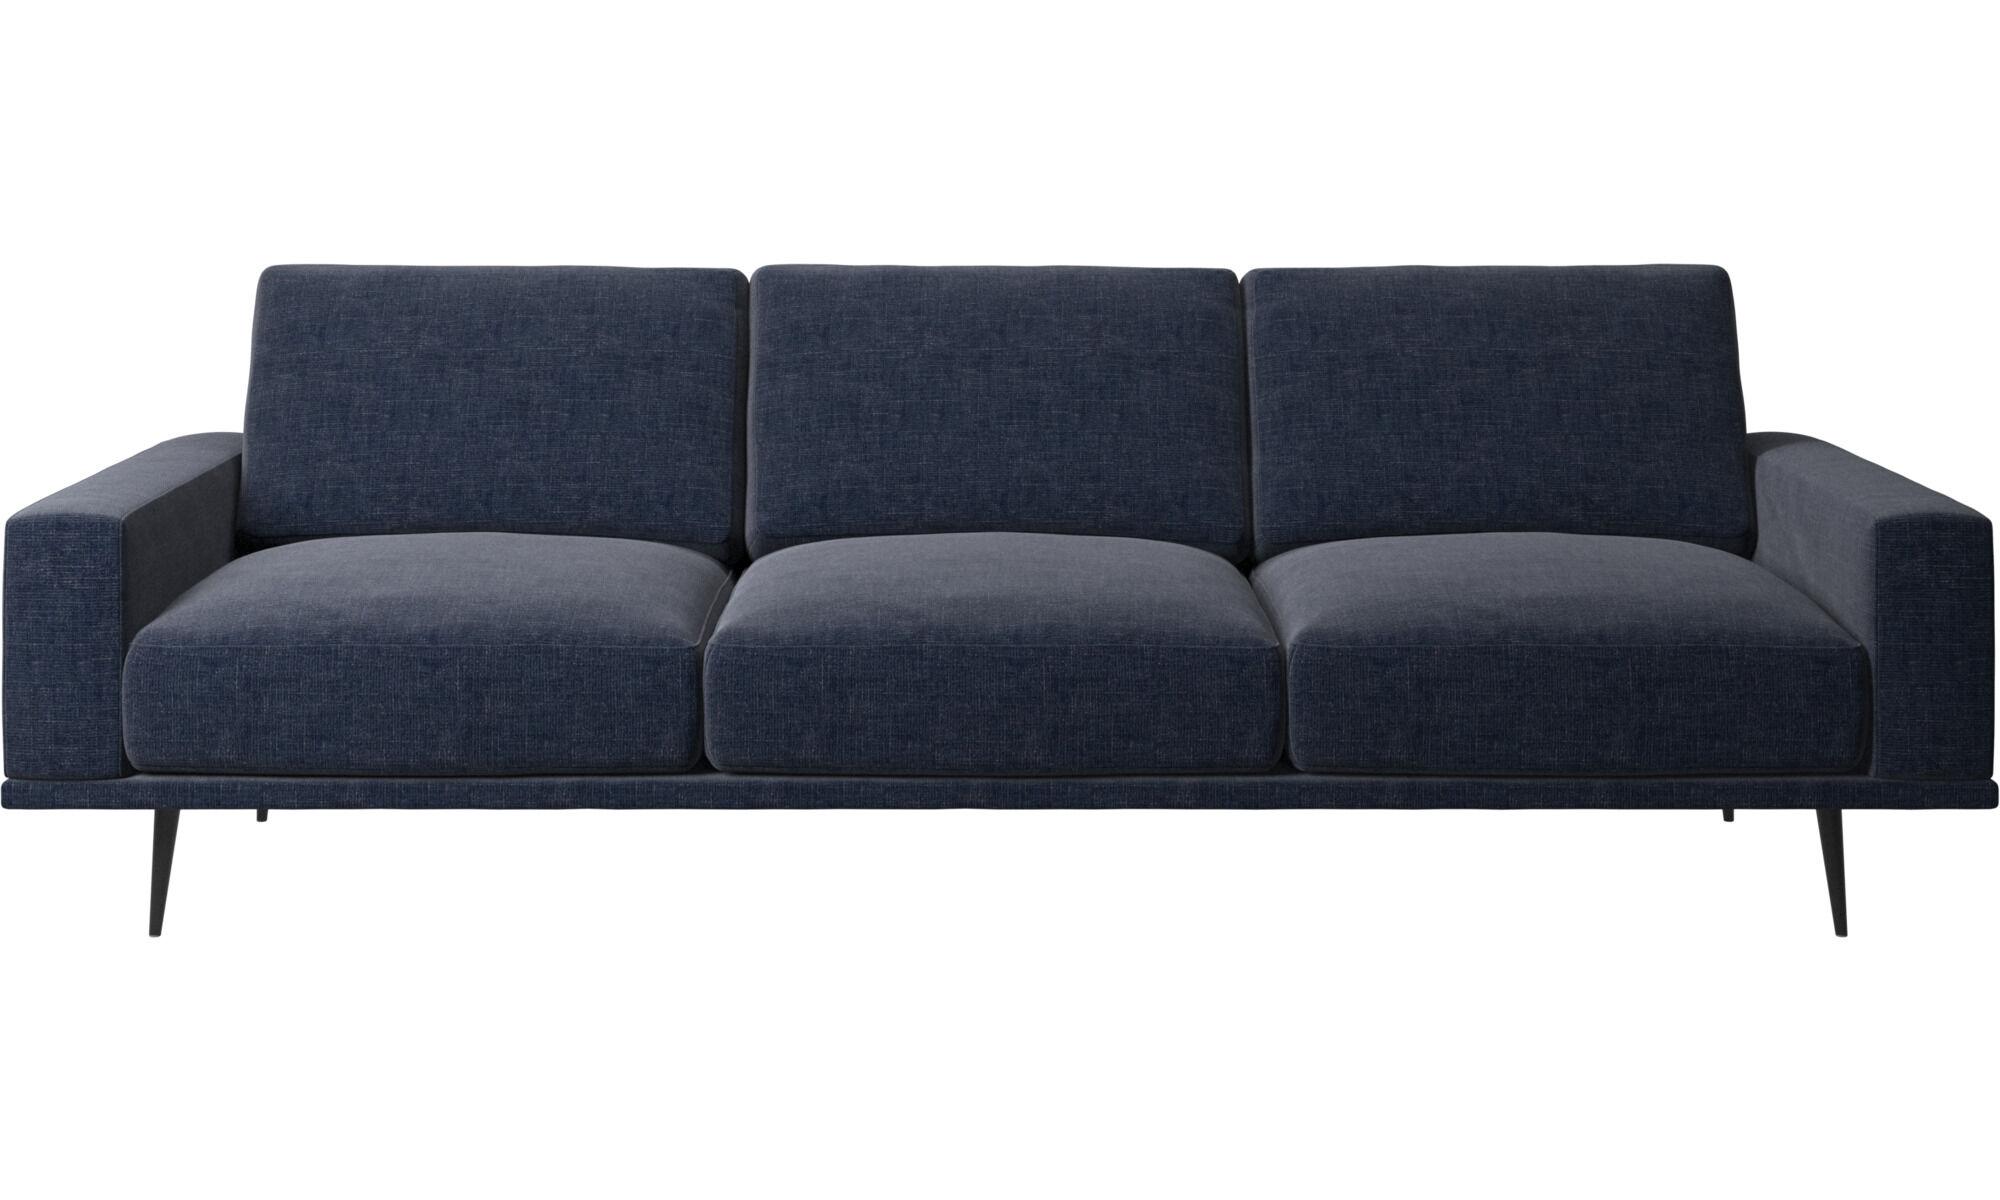 3 Sitzer Sofas   Carlton Sofa   Blau   Stoff ...